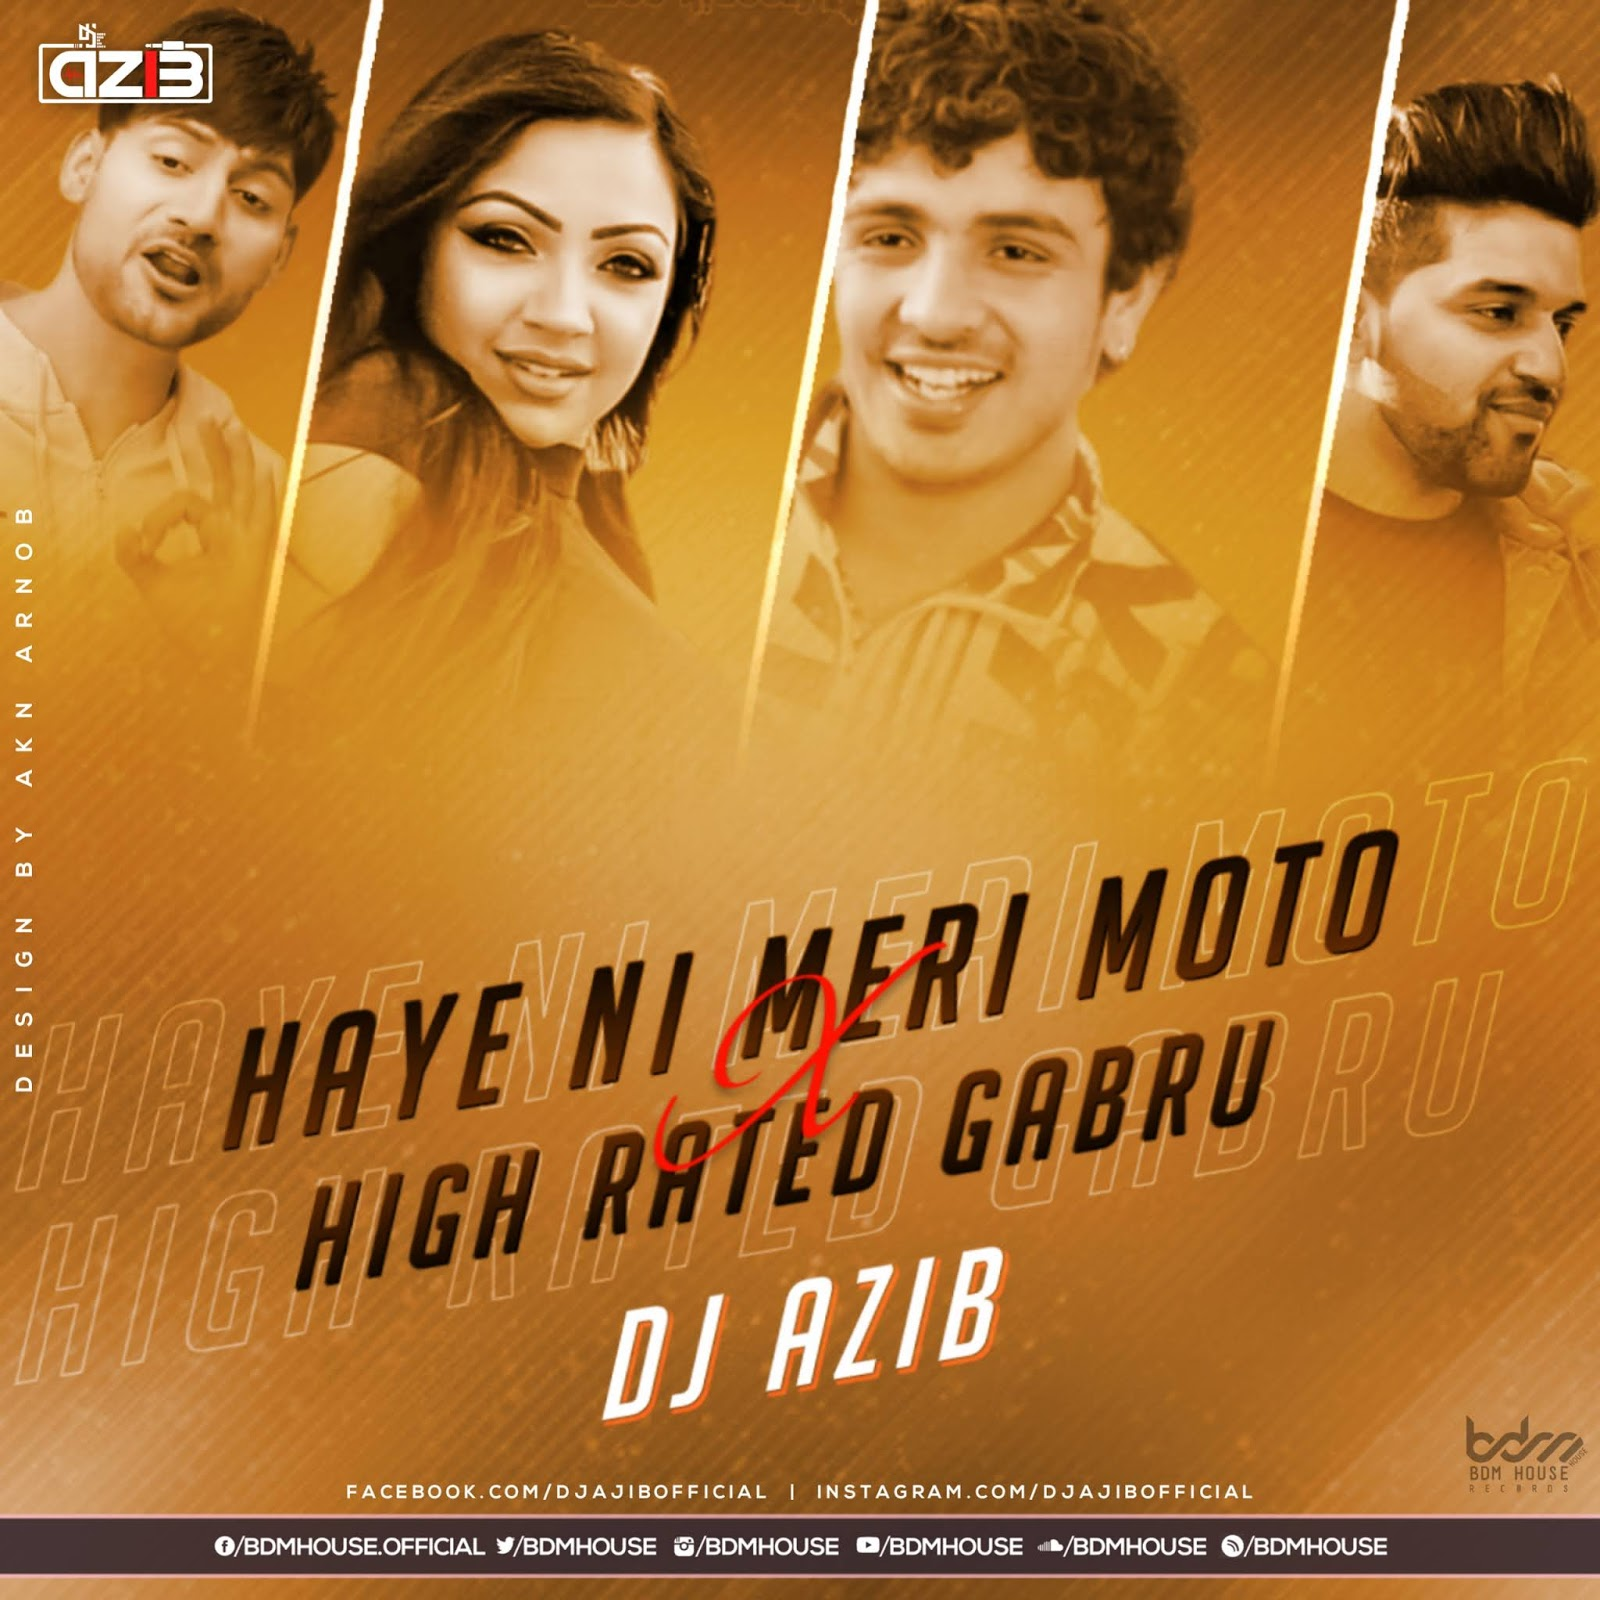 MOTO X HIGH RATED GABRU (MASHUP) - DJ AZIB - BDM HOUSE RECORDS